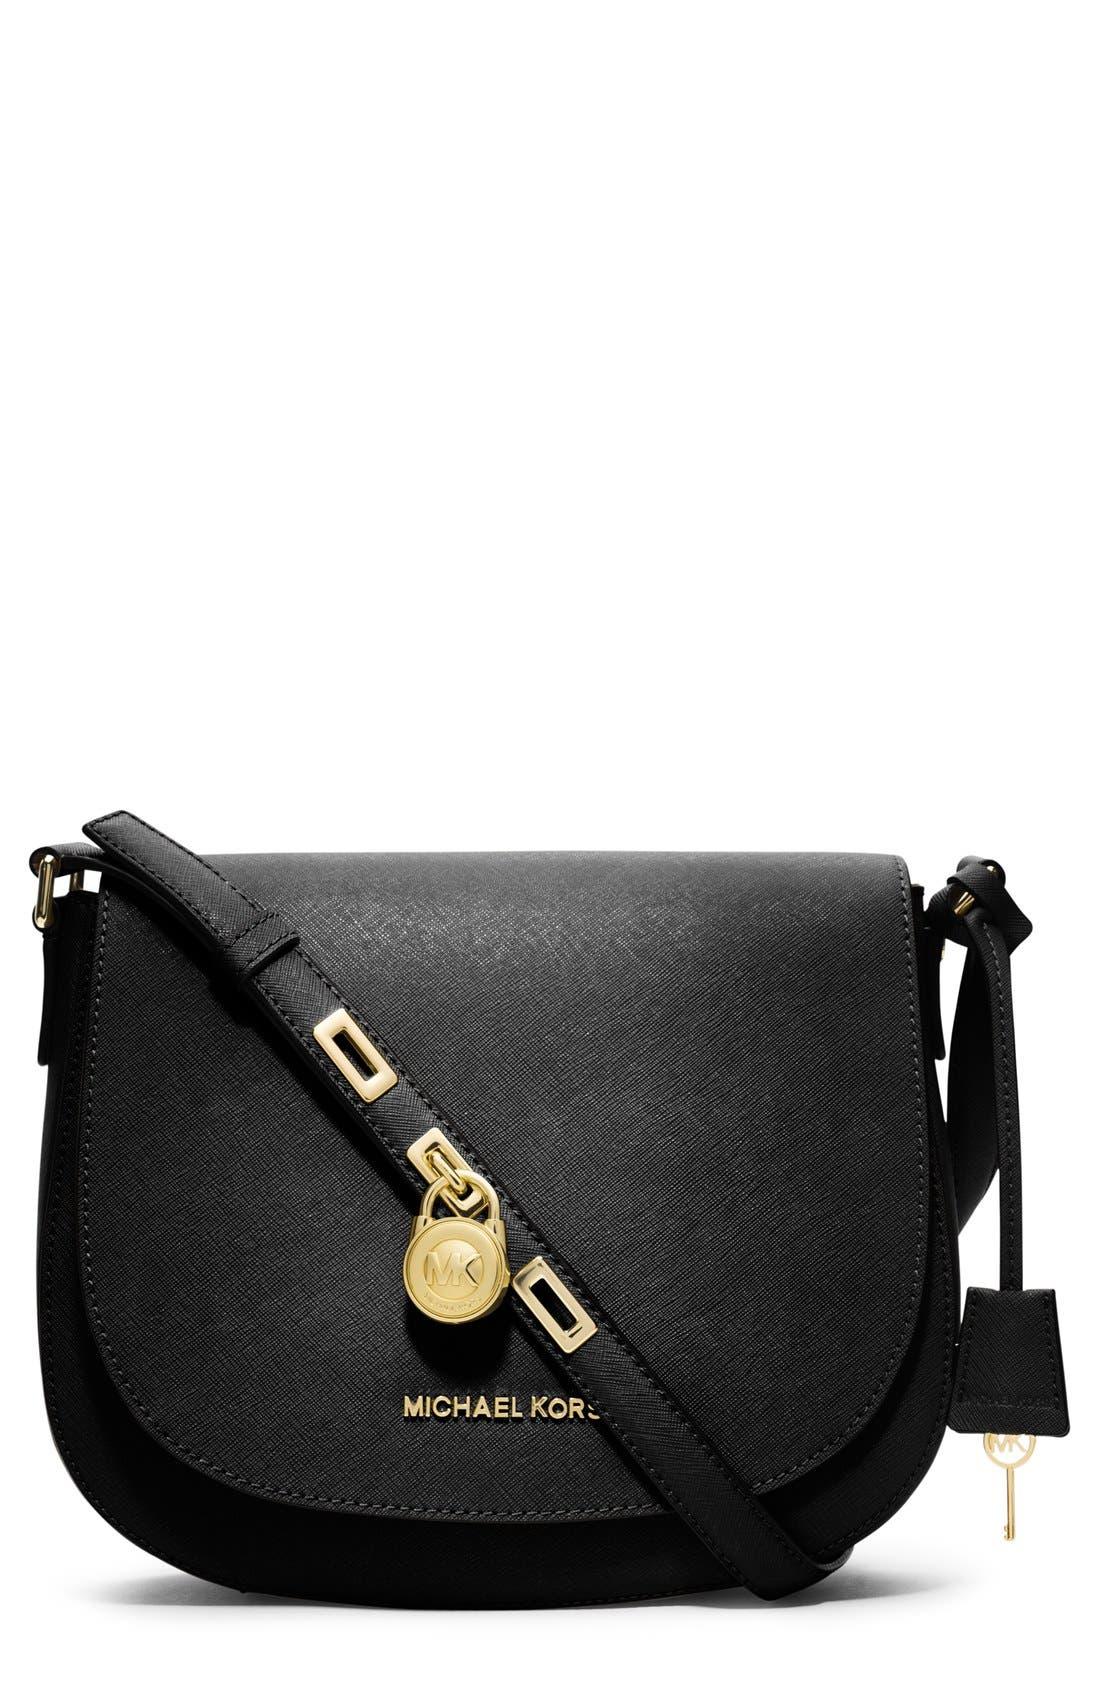 Alternate Image 1 Selected - MICHAEL Michael Kors 'Large' Saffiano Leather Messenger Bag